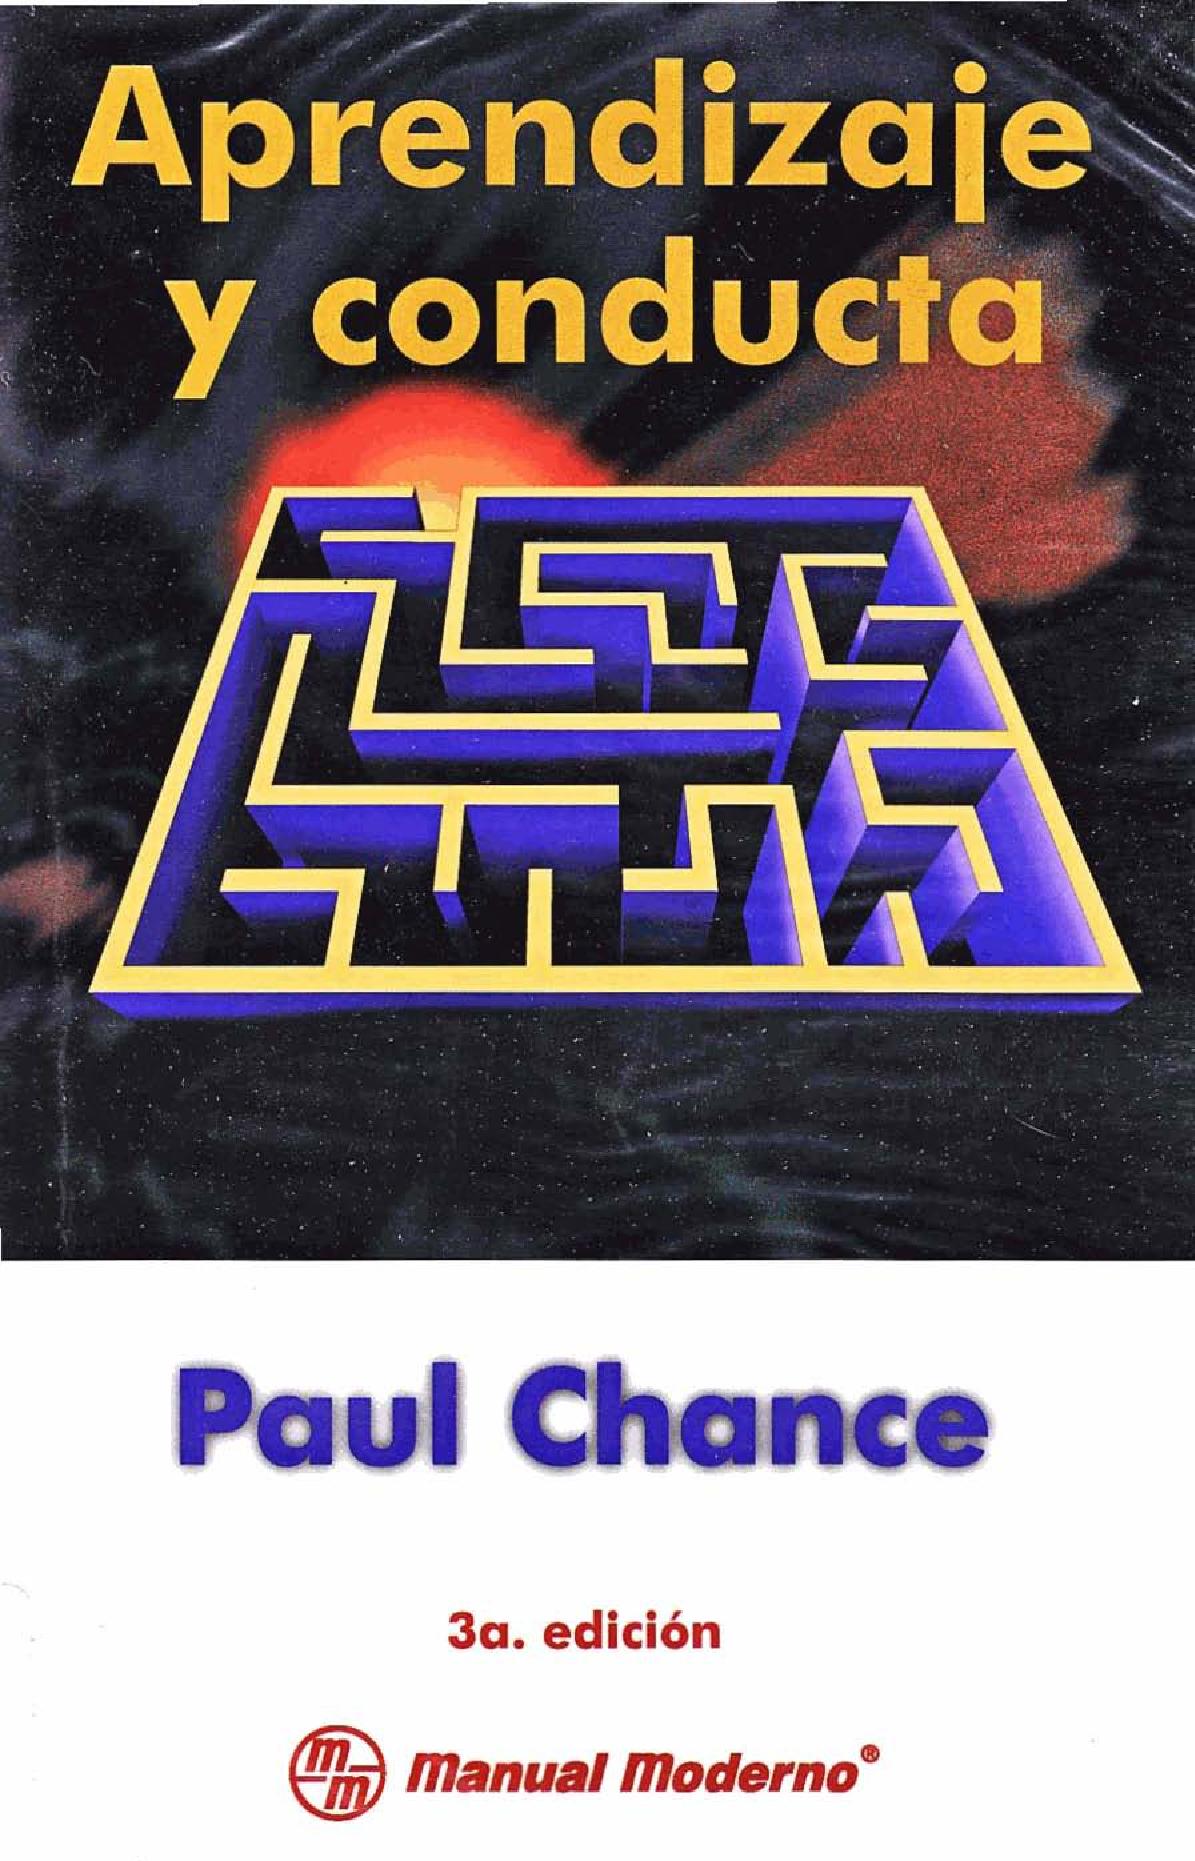 Aprendizaje y Conducta-Paul Chance (Pdf) - Documents | Libros ...